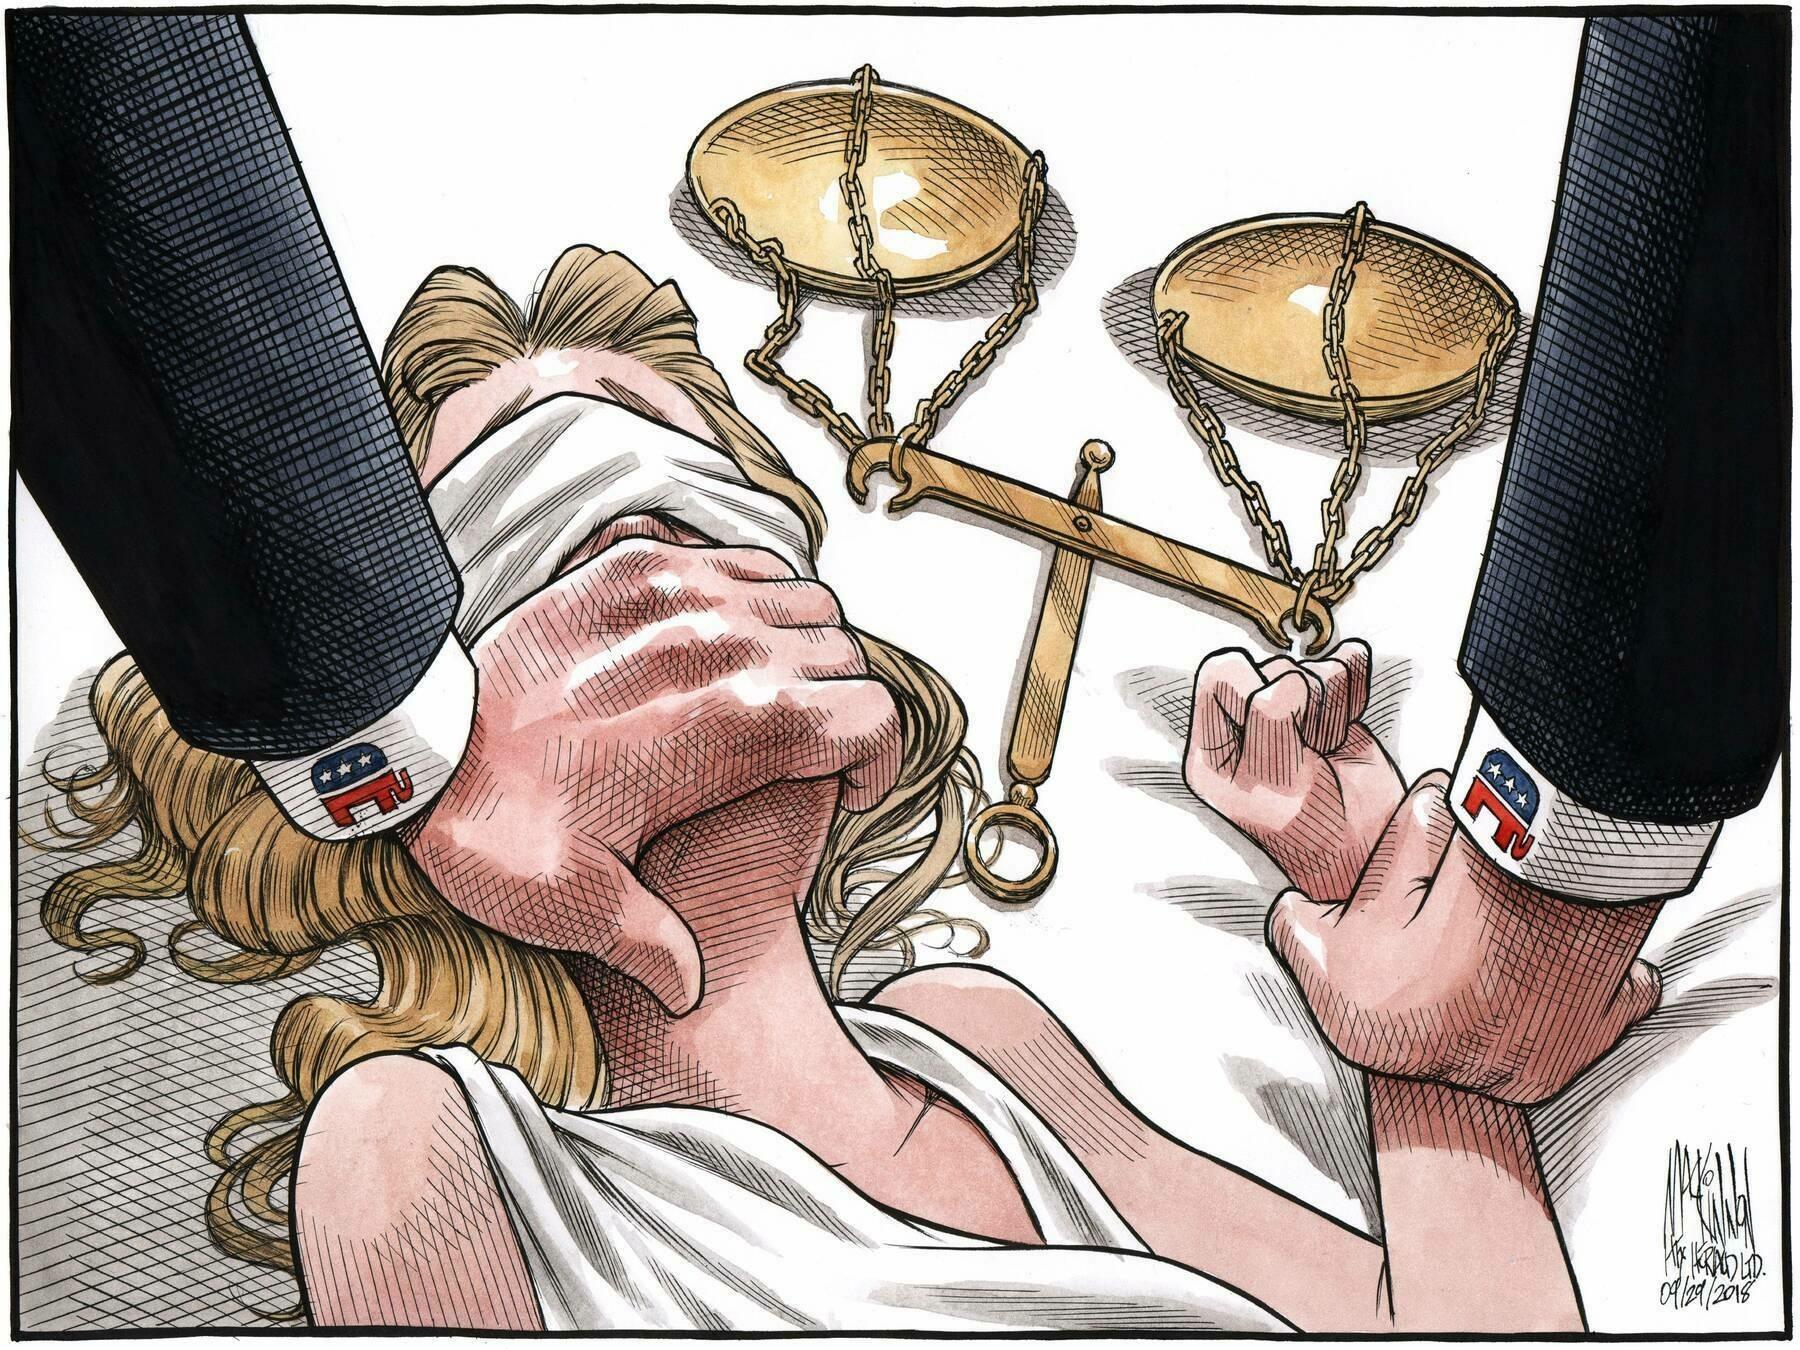 Bruce MacKinnon's editorial cartoon for Sept. 29, 2018. - Bruce MacKinnon, Copyright: The Chronicle Herald